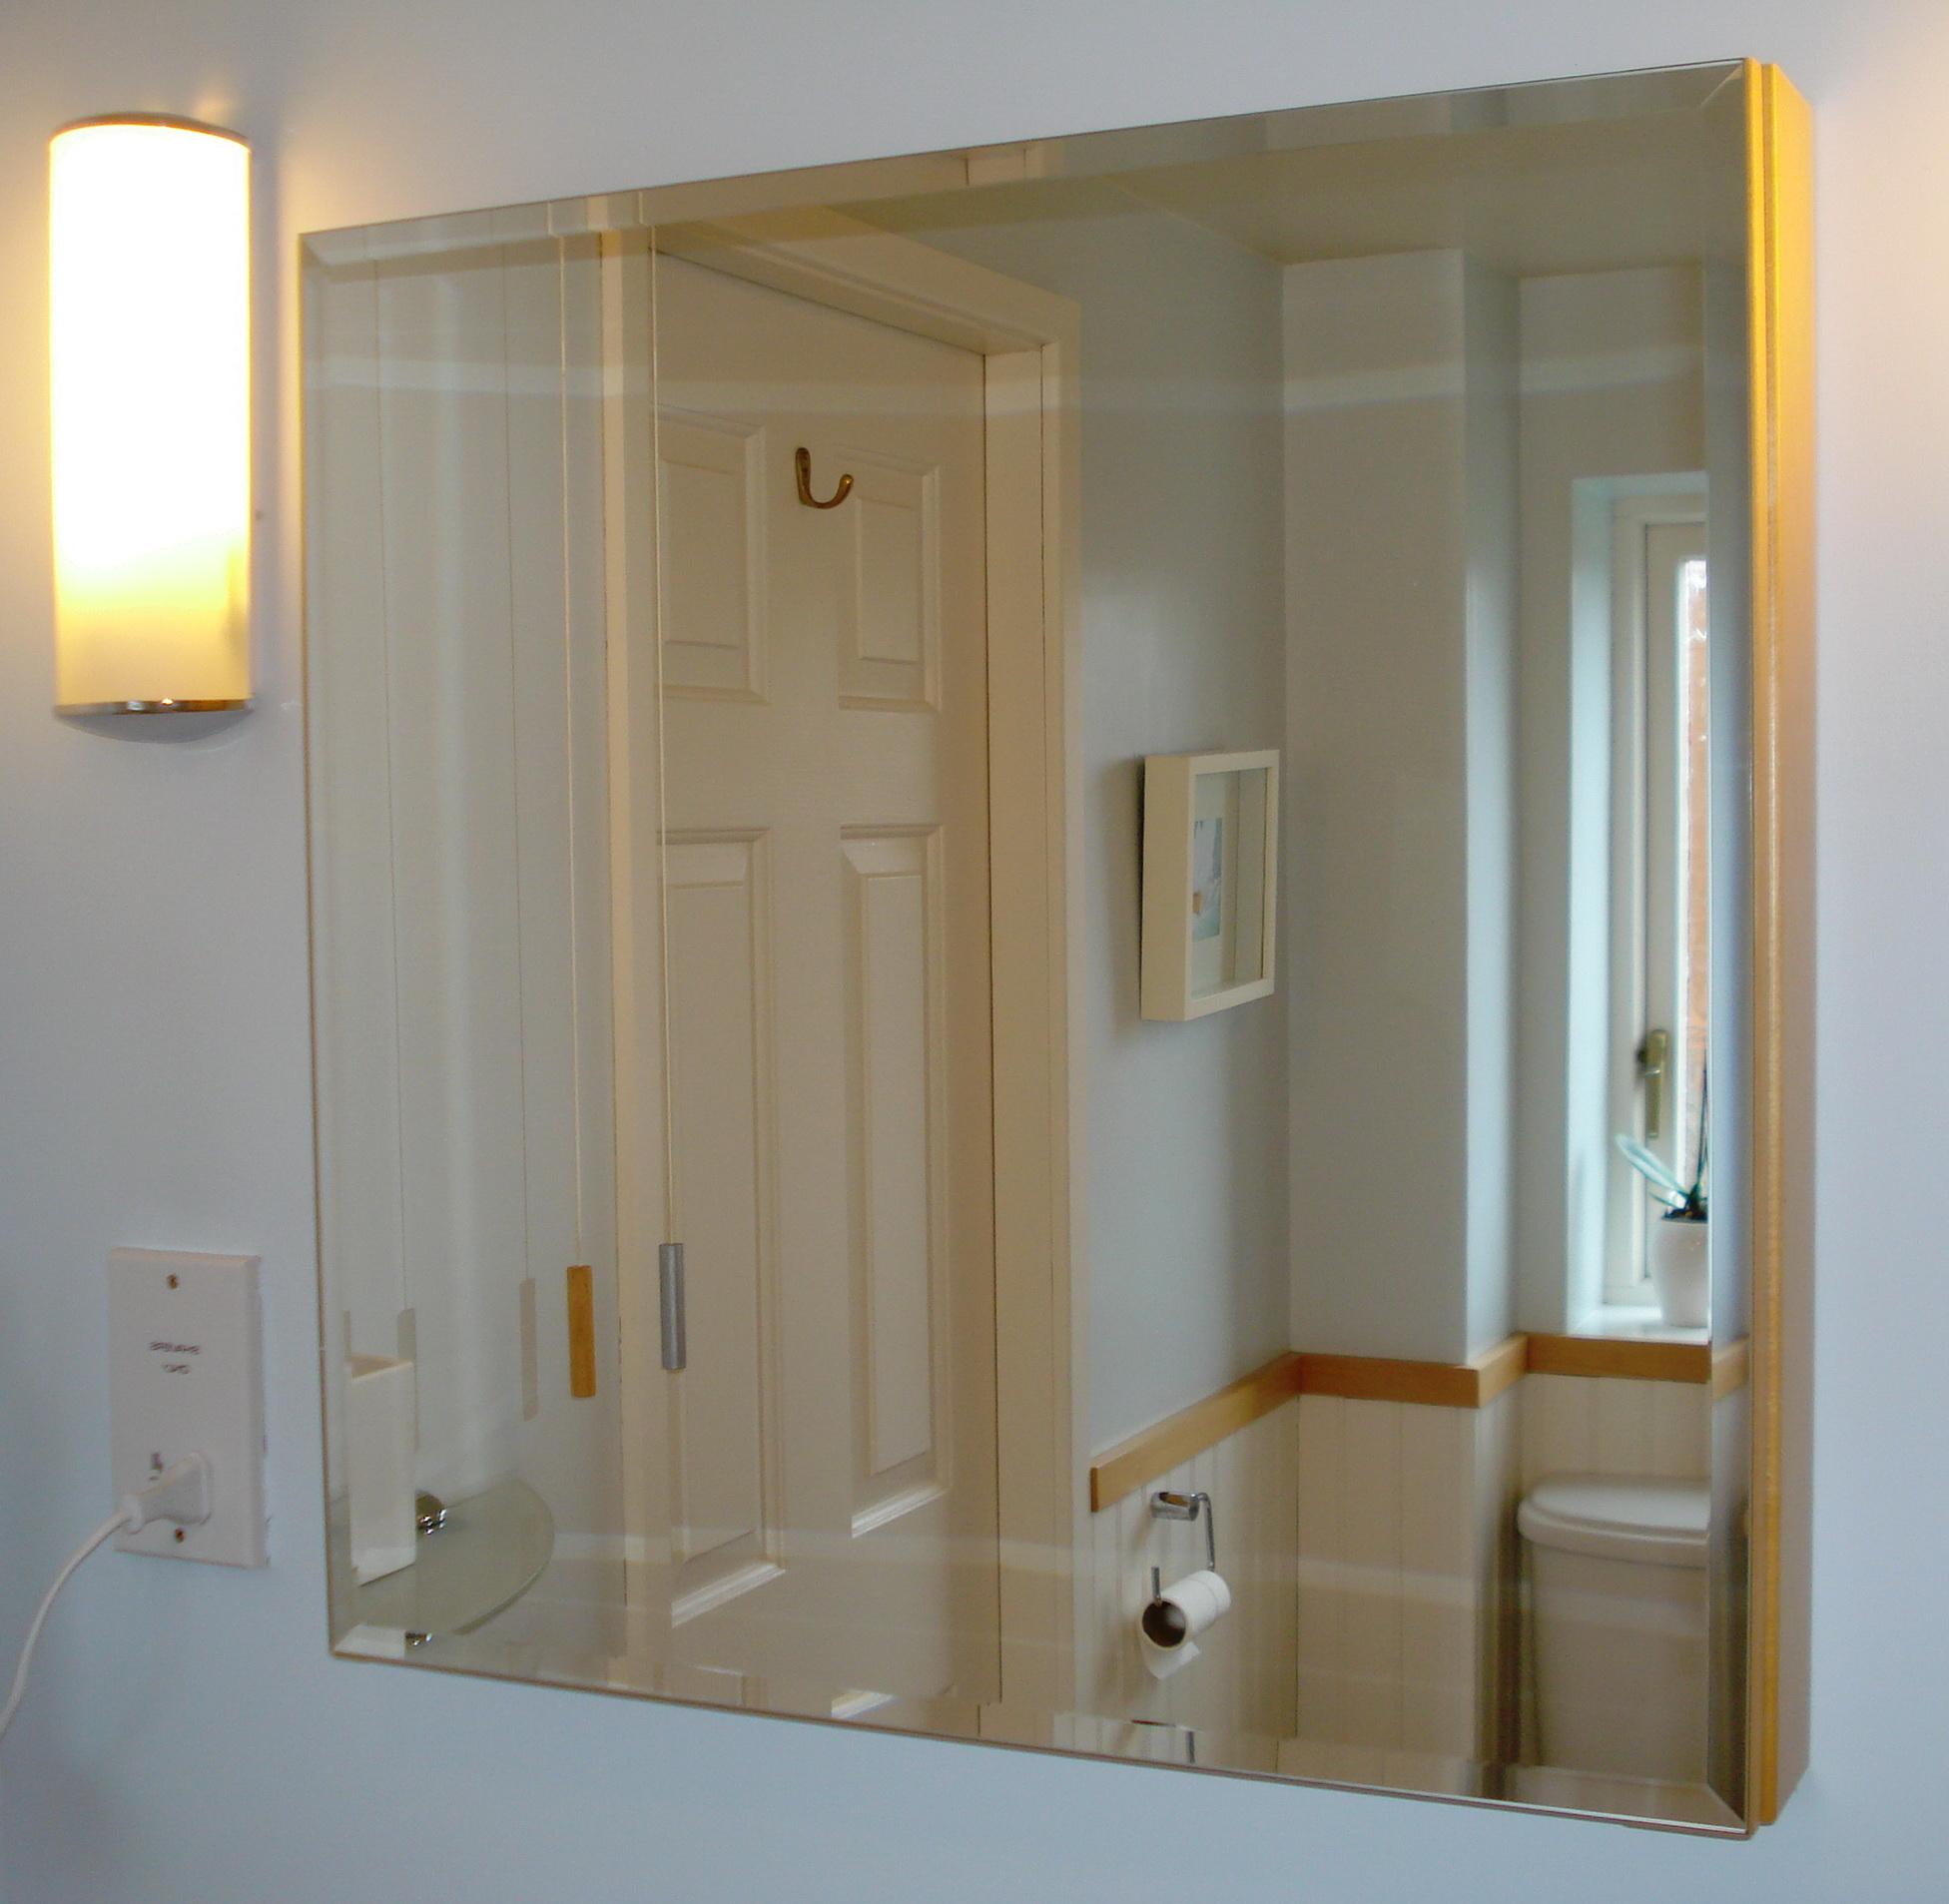 ikea lillangen bathroom mirror cabinet home design ideas. Black Bedroom Furniture Sets. Home Design Ideas